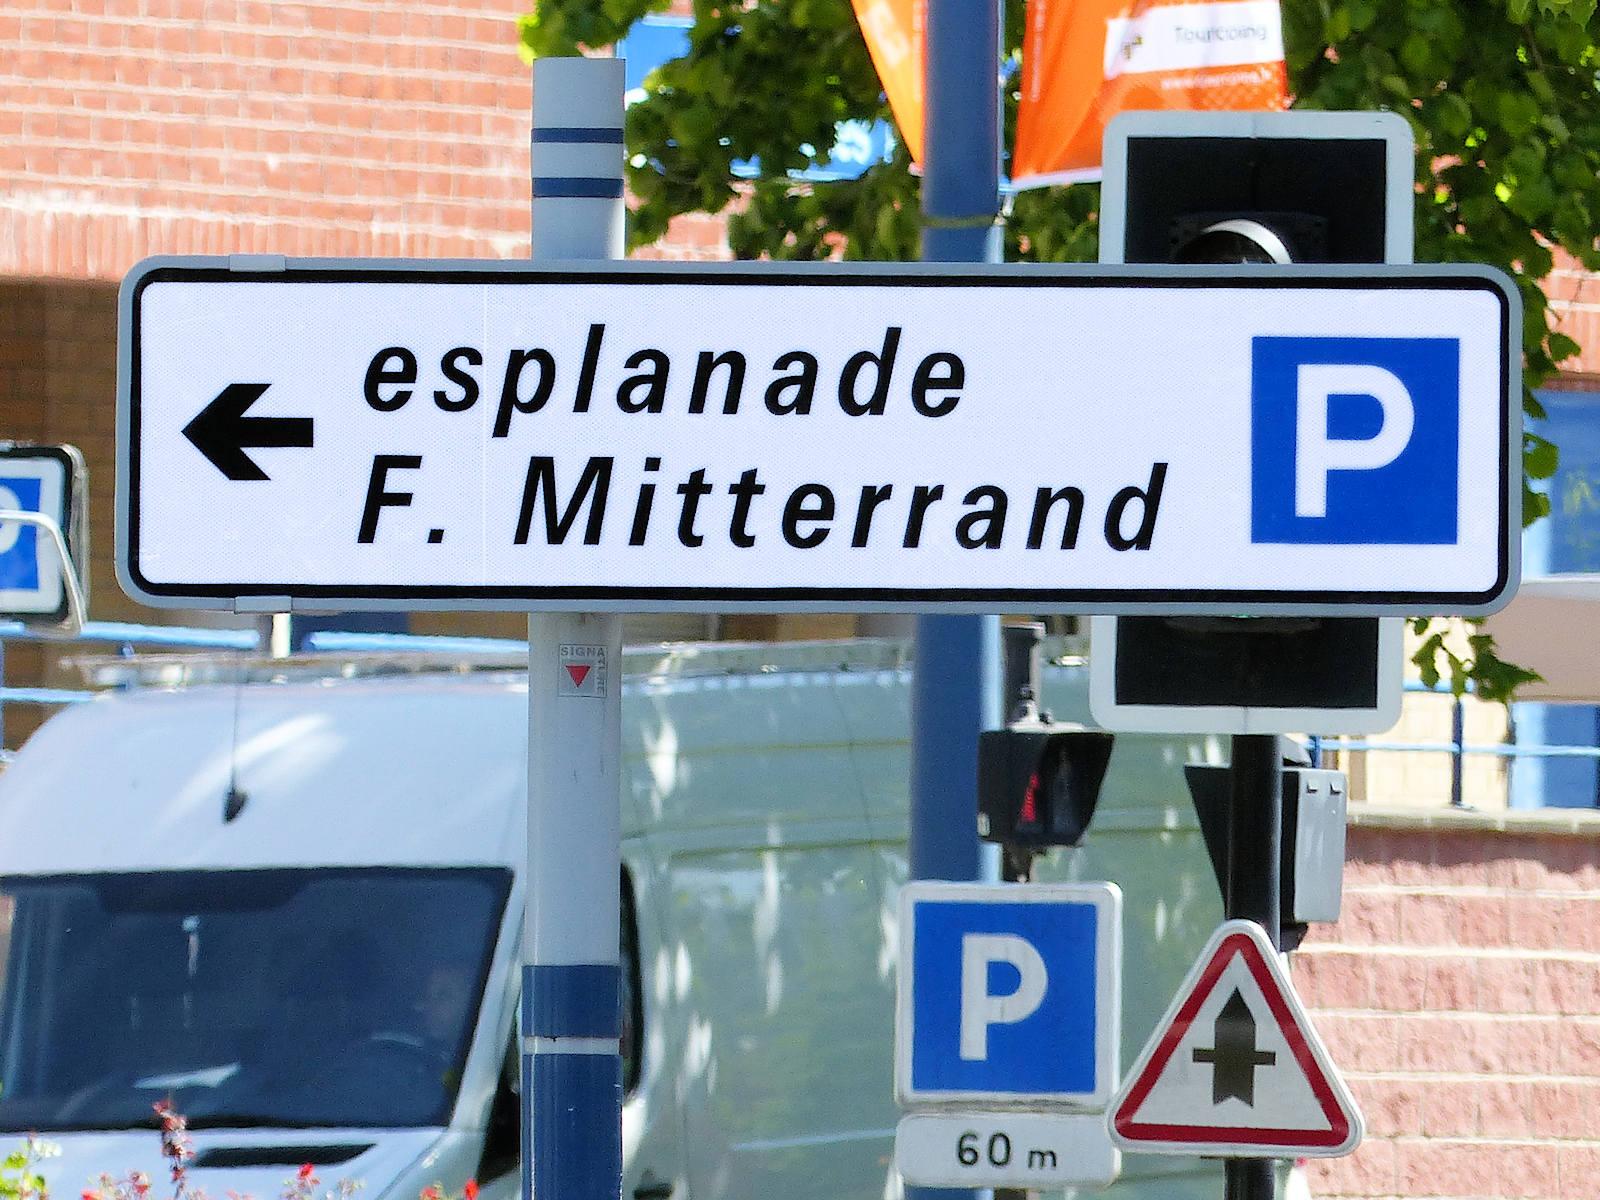 Parking Gratuit Esplanade Mitterrand, Tourcoing